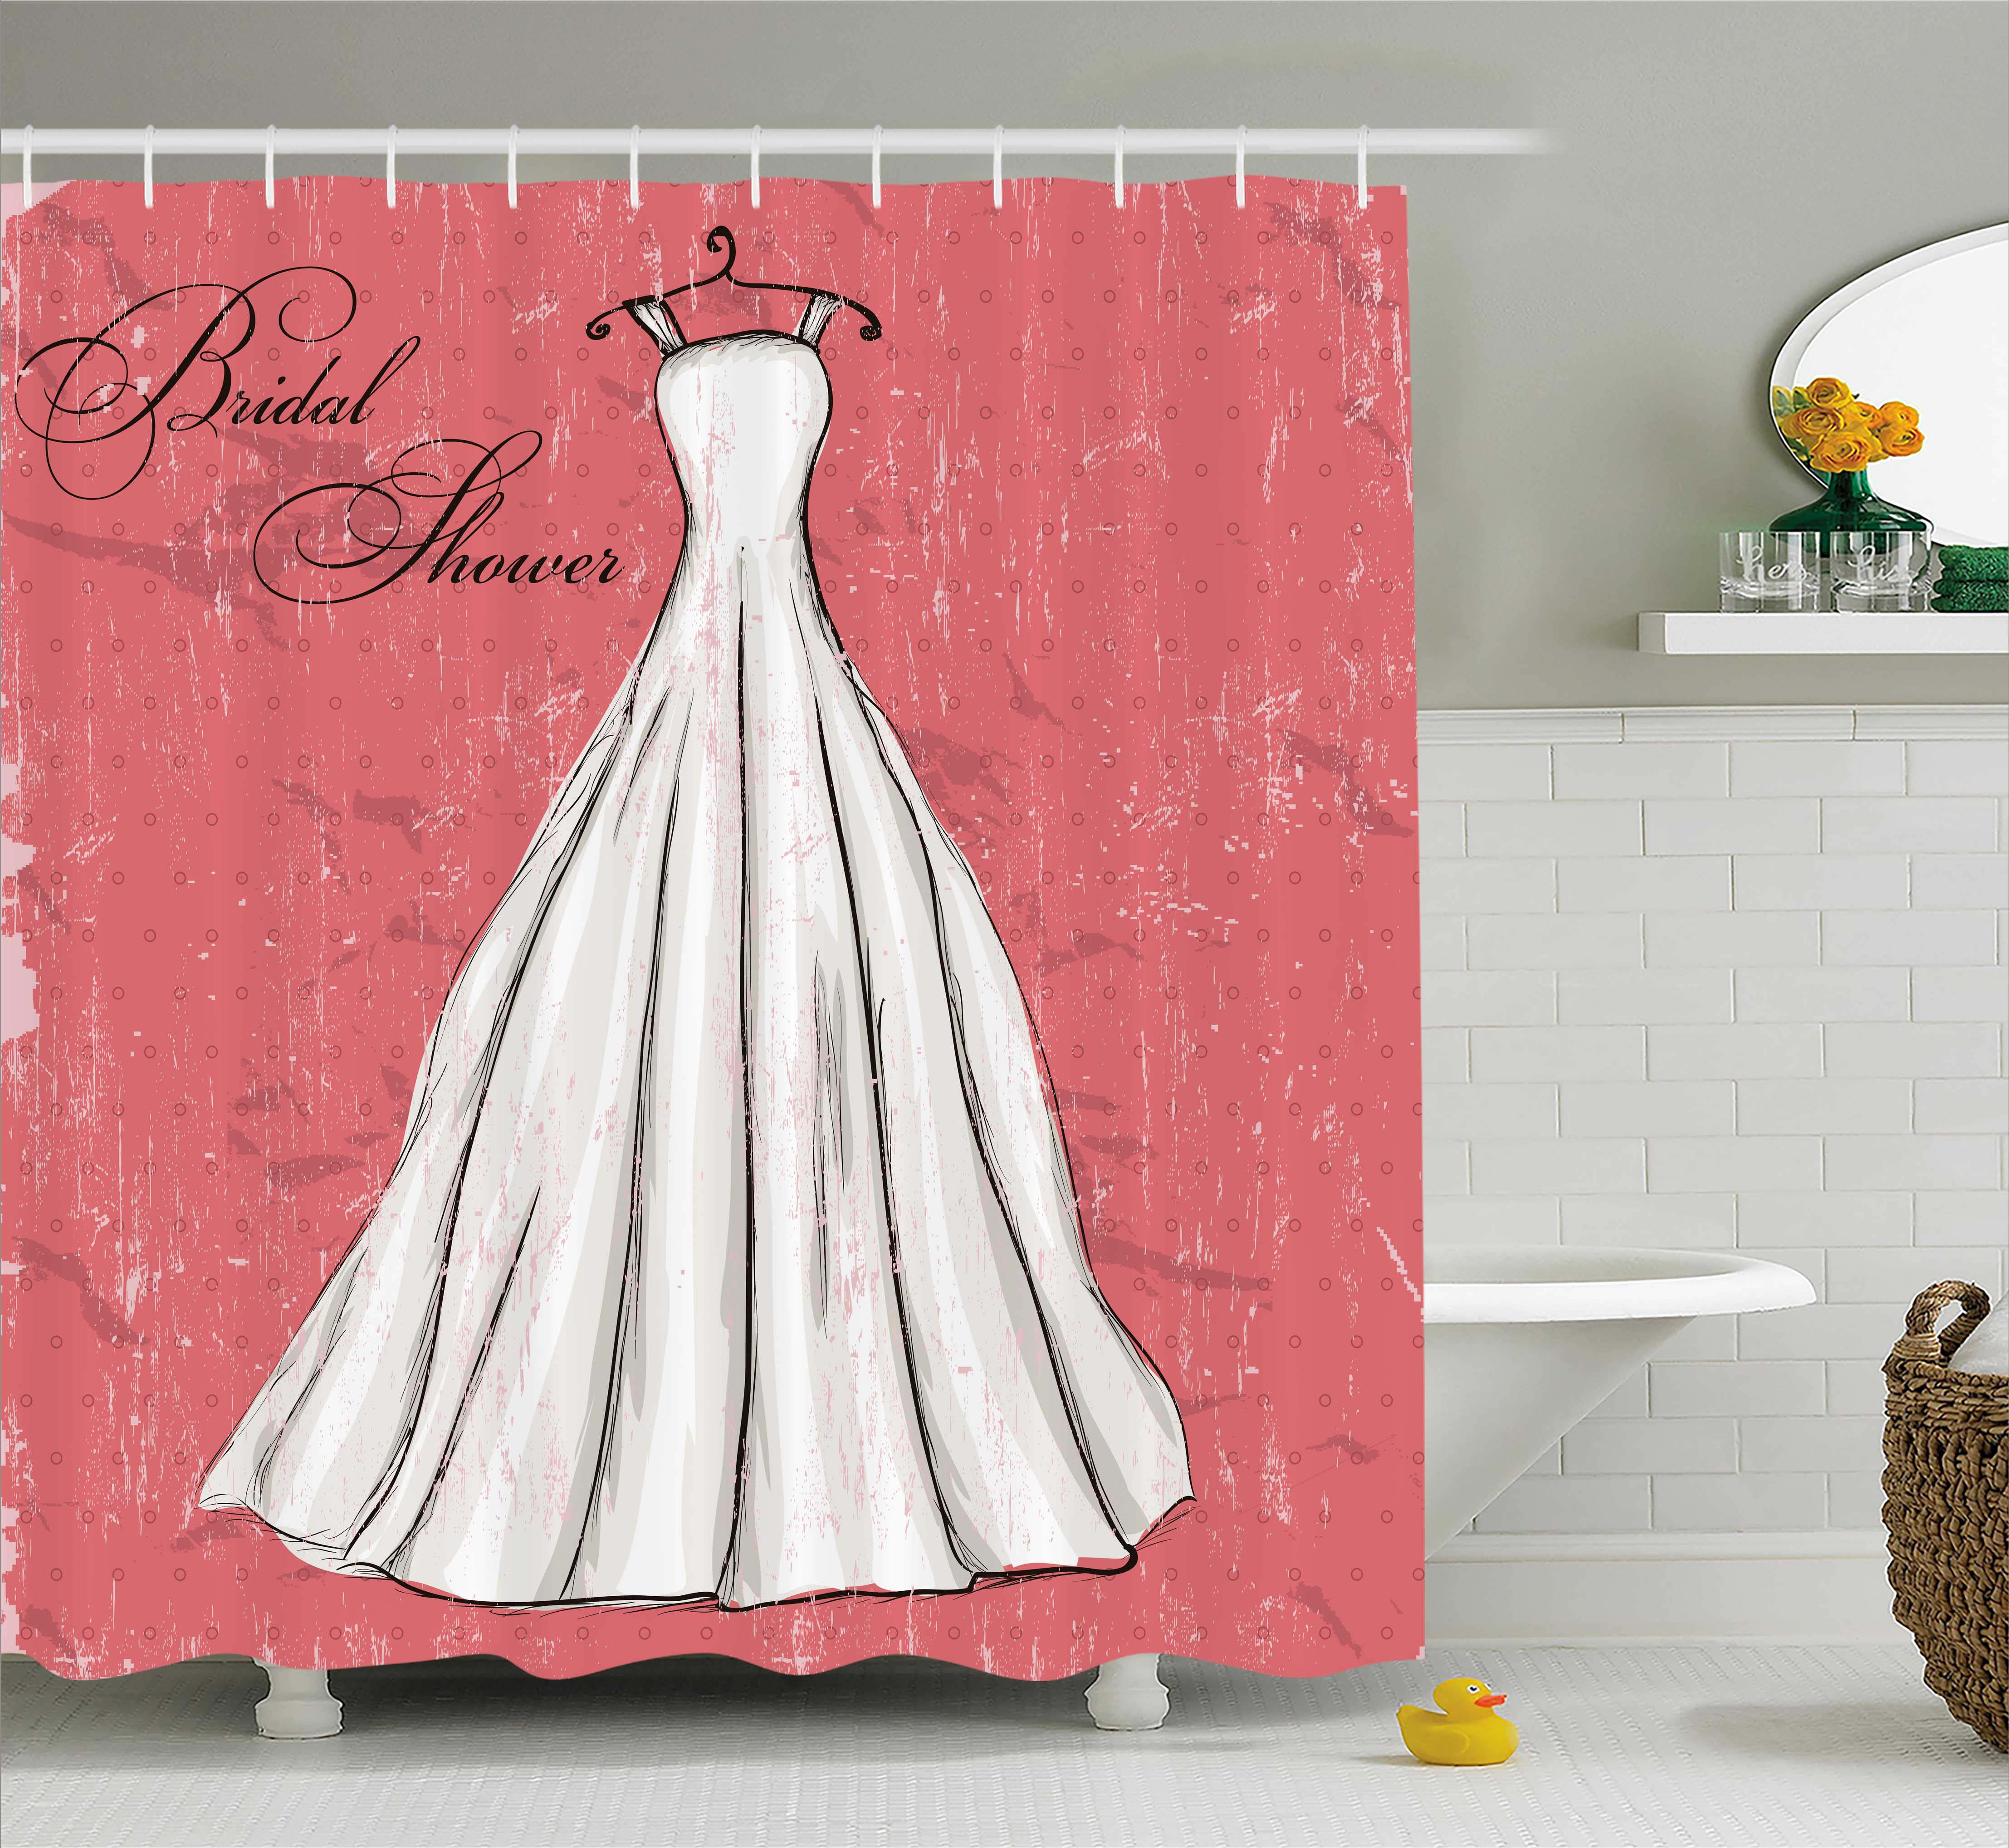 Bridal Shower Decorations Shower Curtain, Pink Grunge Bac...